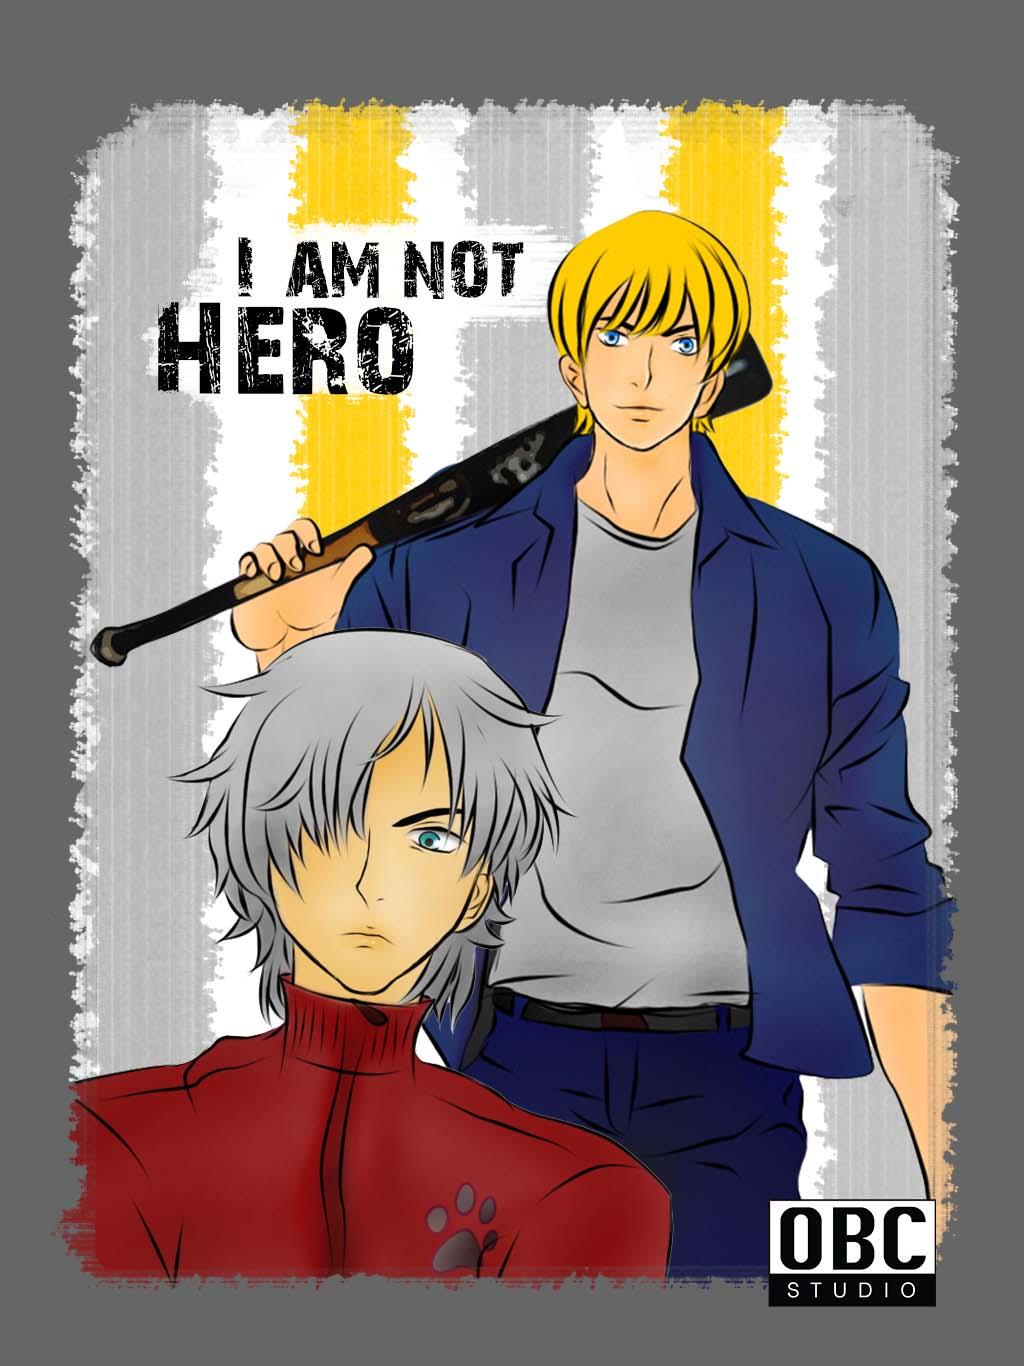 I'am not hero (พระเอกตาย คอนเทสต์)